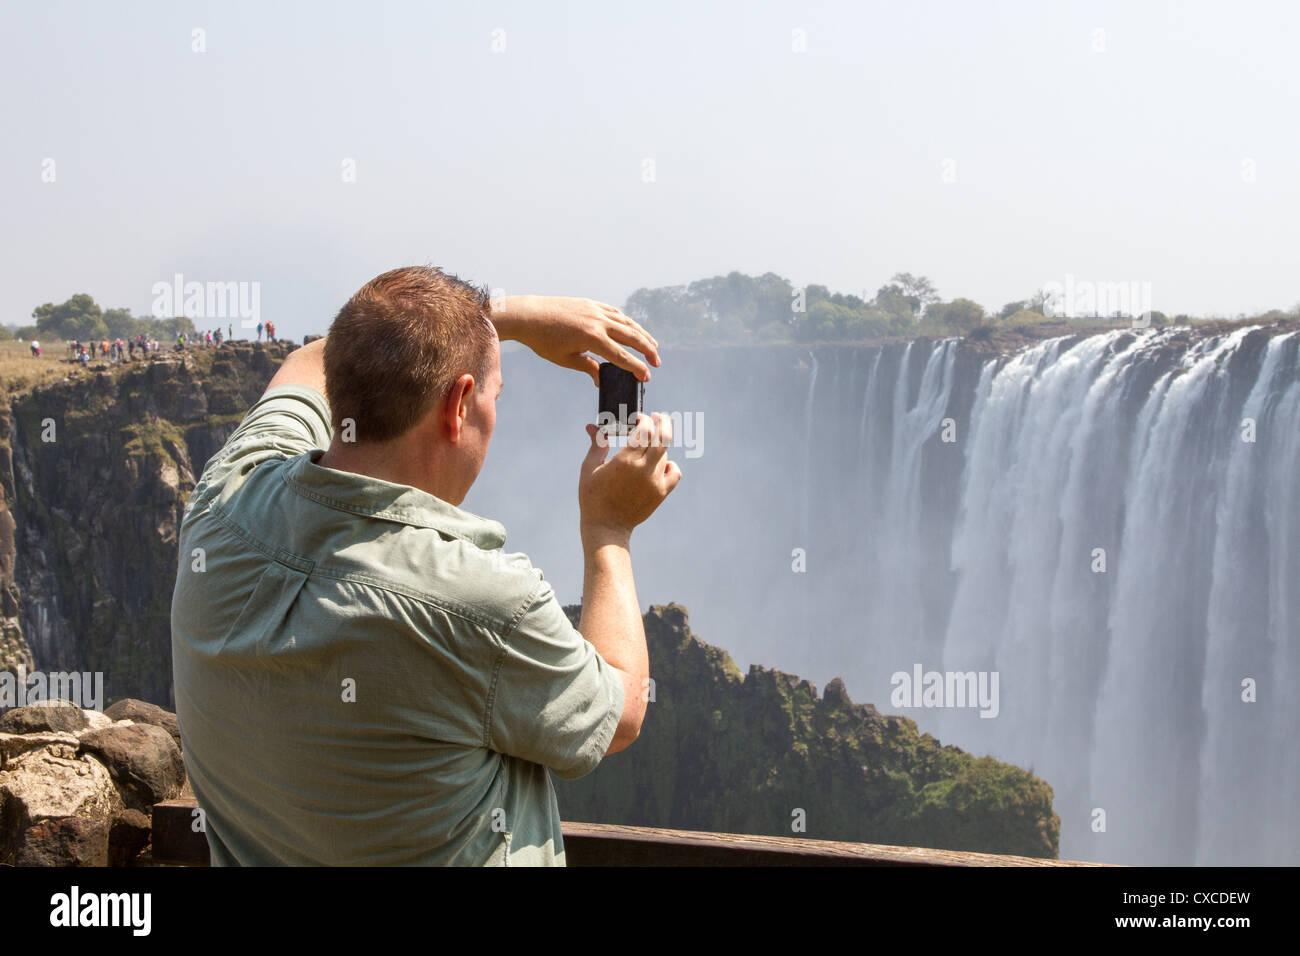 a-tourist-photographs-victoria-falls-fro